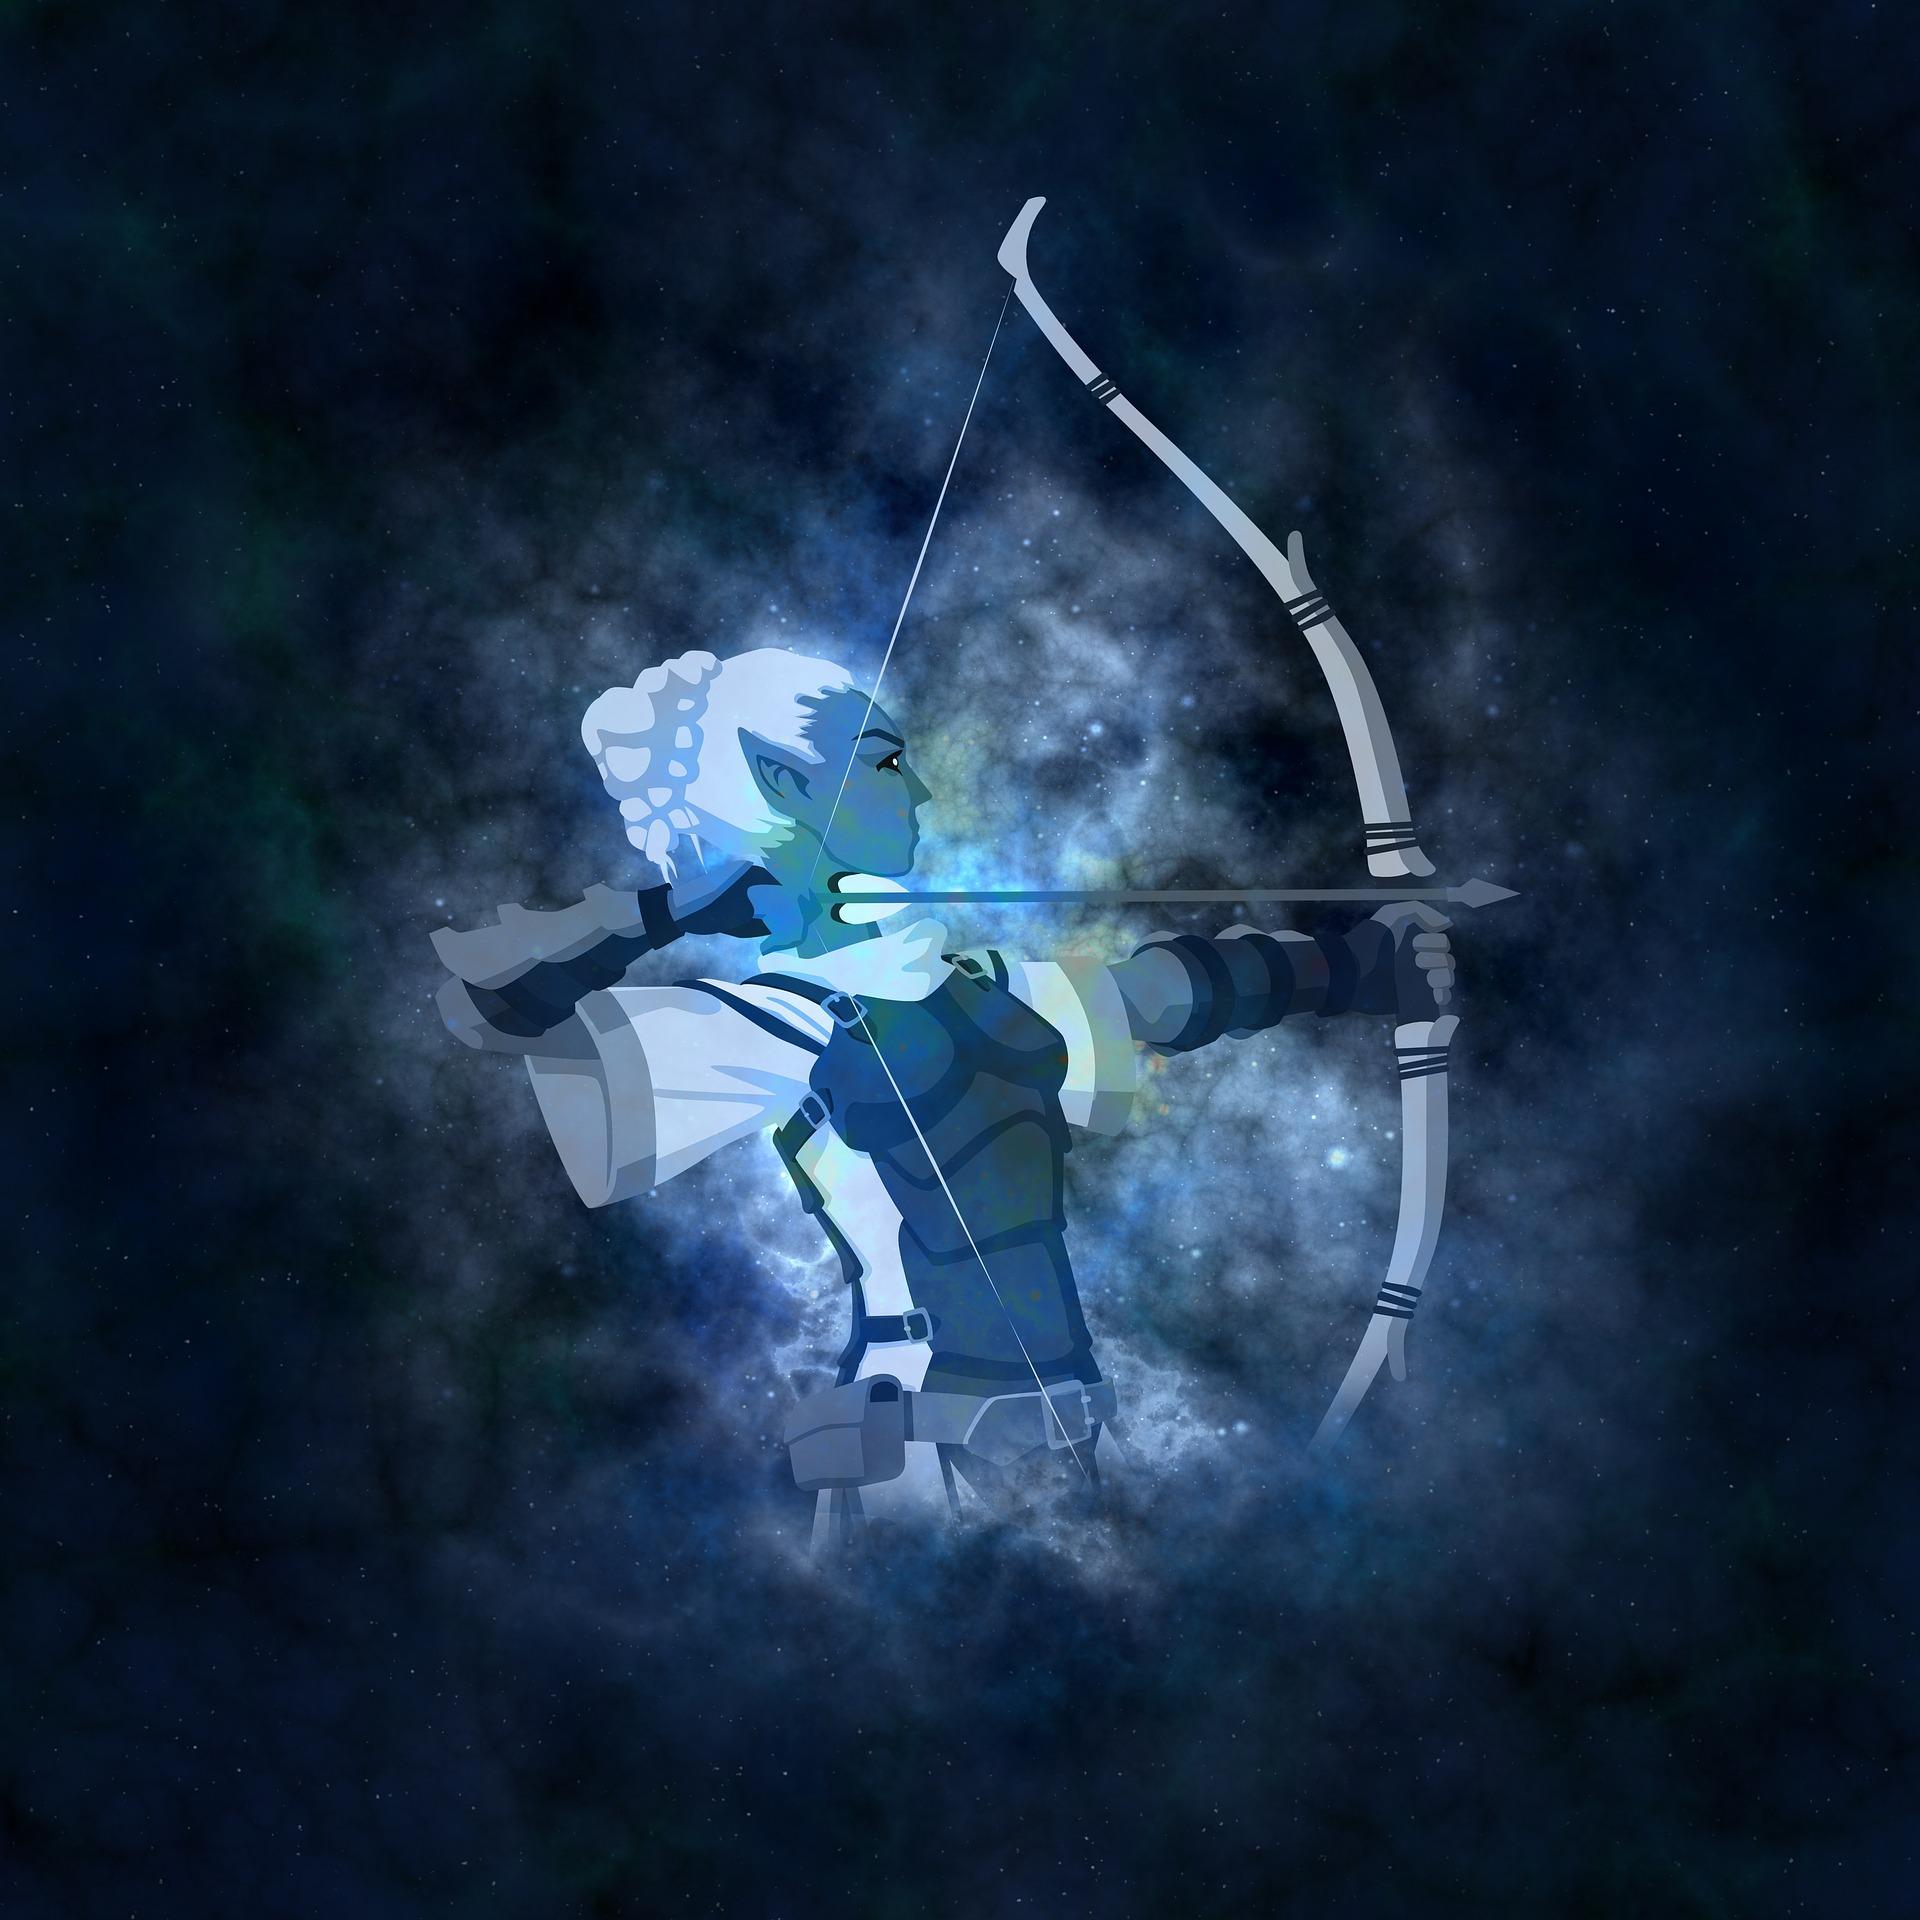 Horoscop săptămânal Minerva 7-13 septembrie 2020 - Săgetător